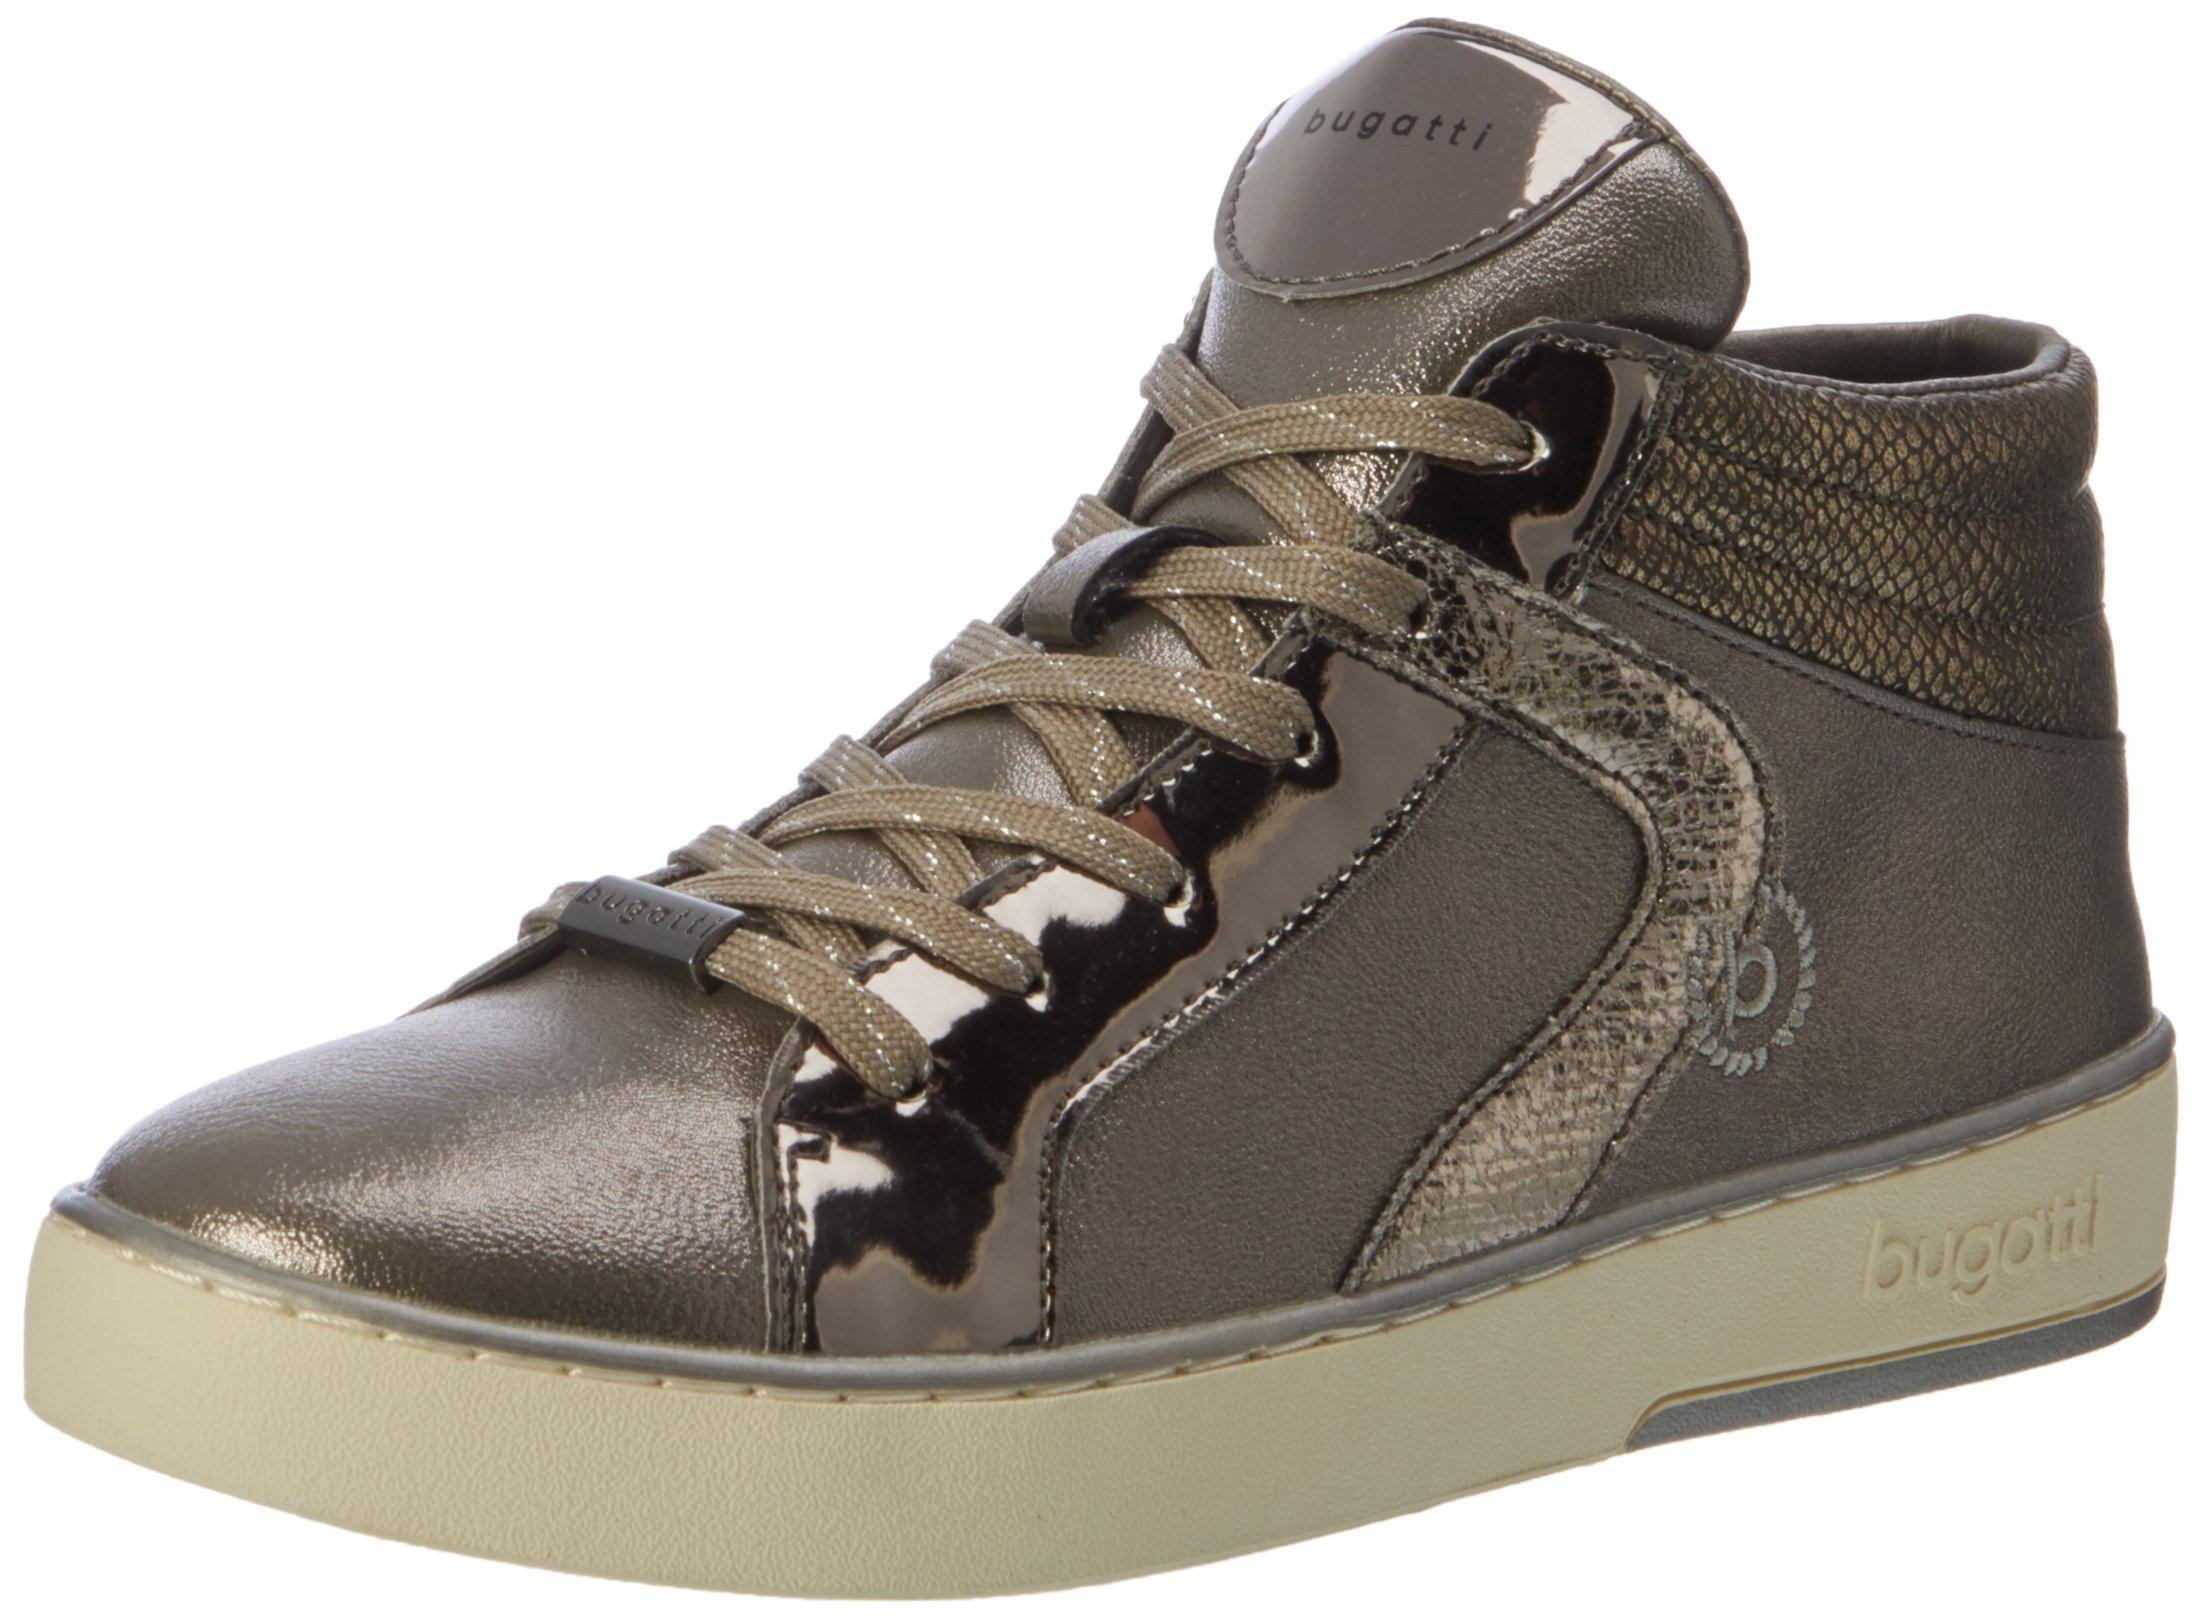 422291305050Sneakers metallic39 Eu Bugatti Hautes FemmeMarrontaupe R4j3AL5q